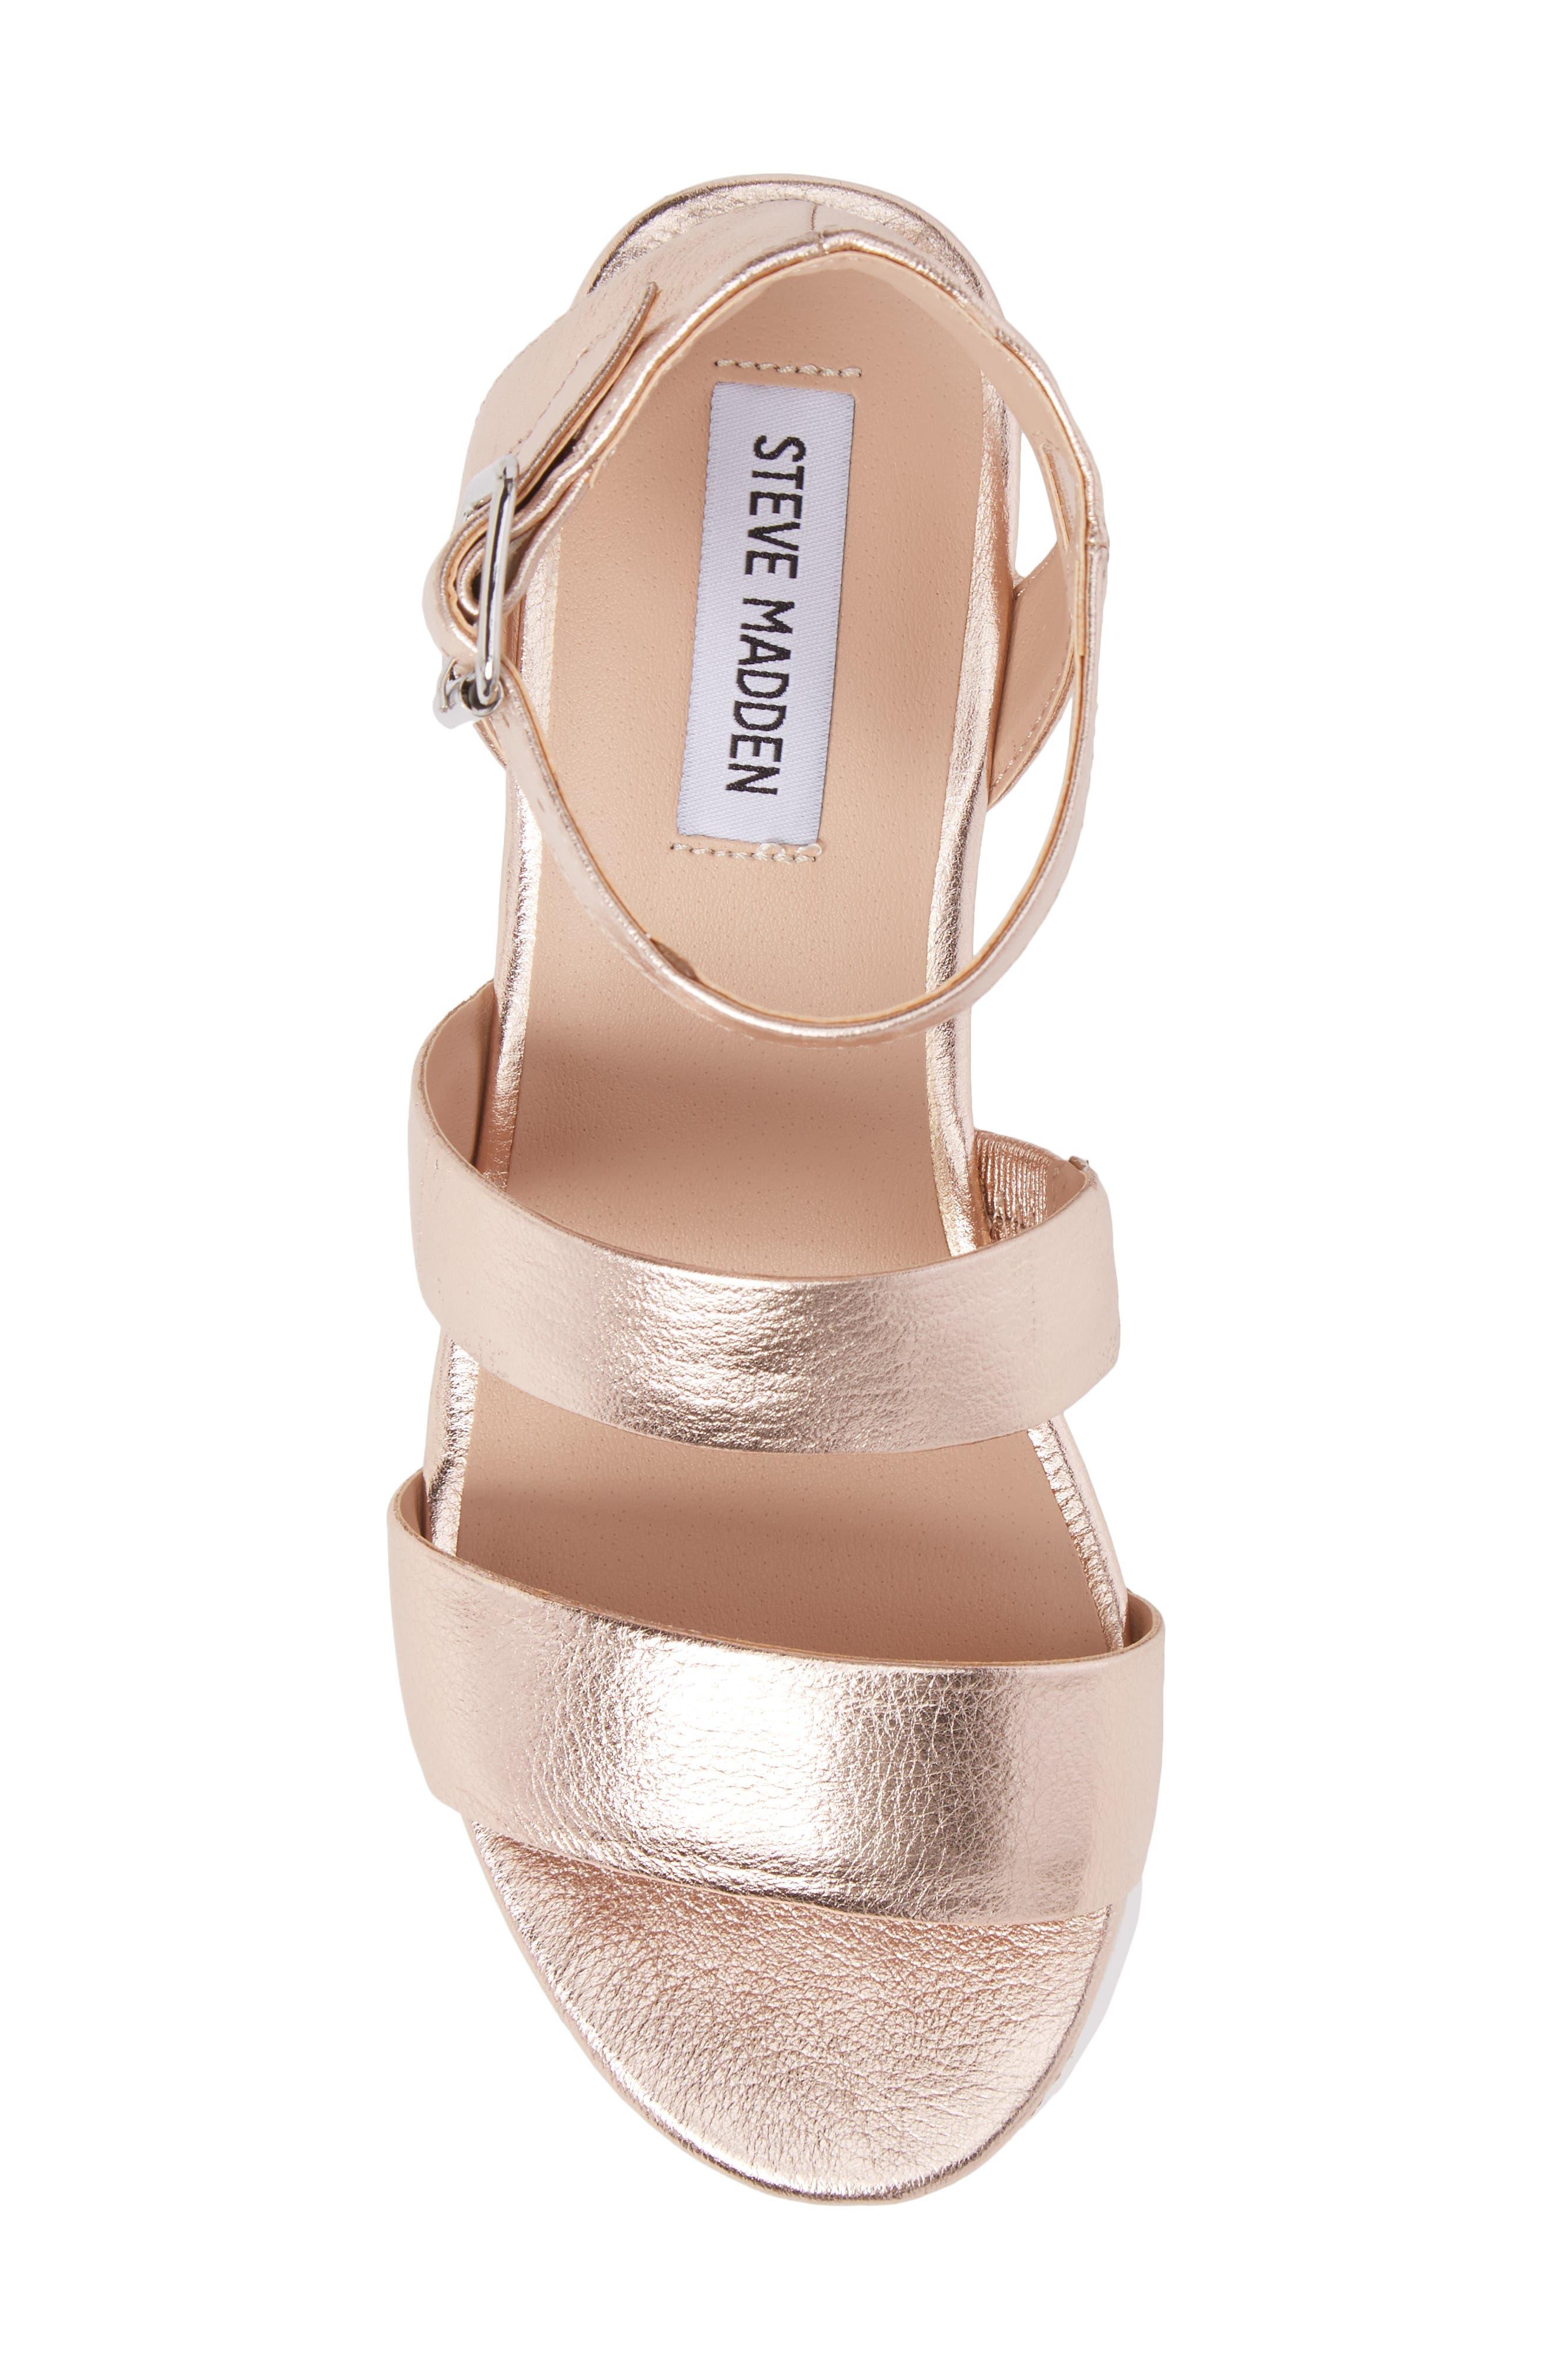 Kirsten Layered Platform Sandal,                             Alternate thumbnail 5, color,                             Rose Leather